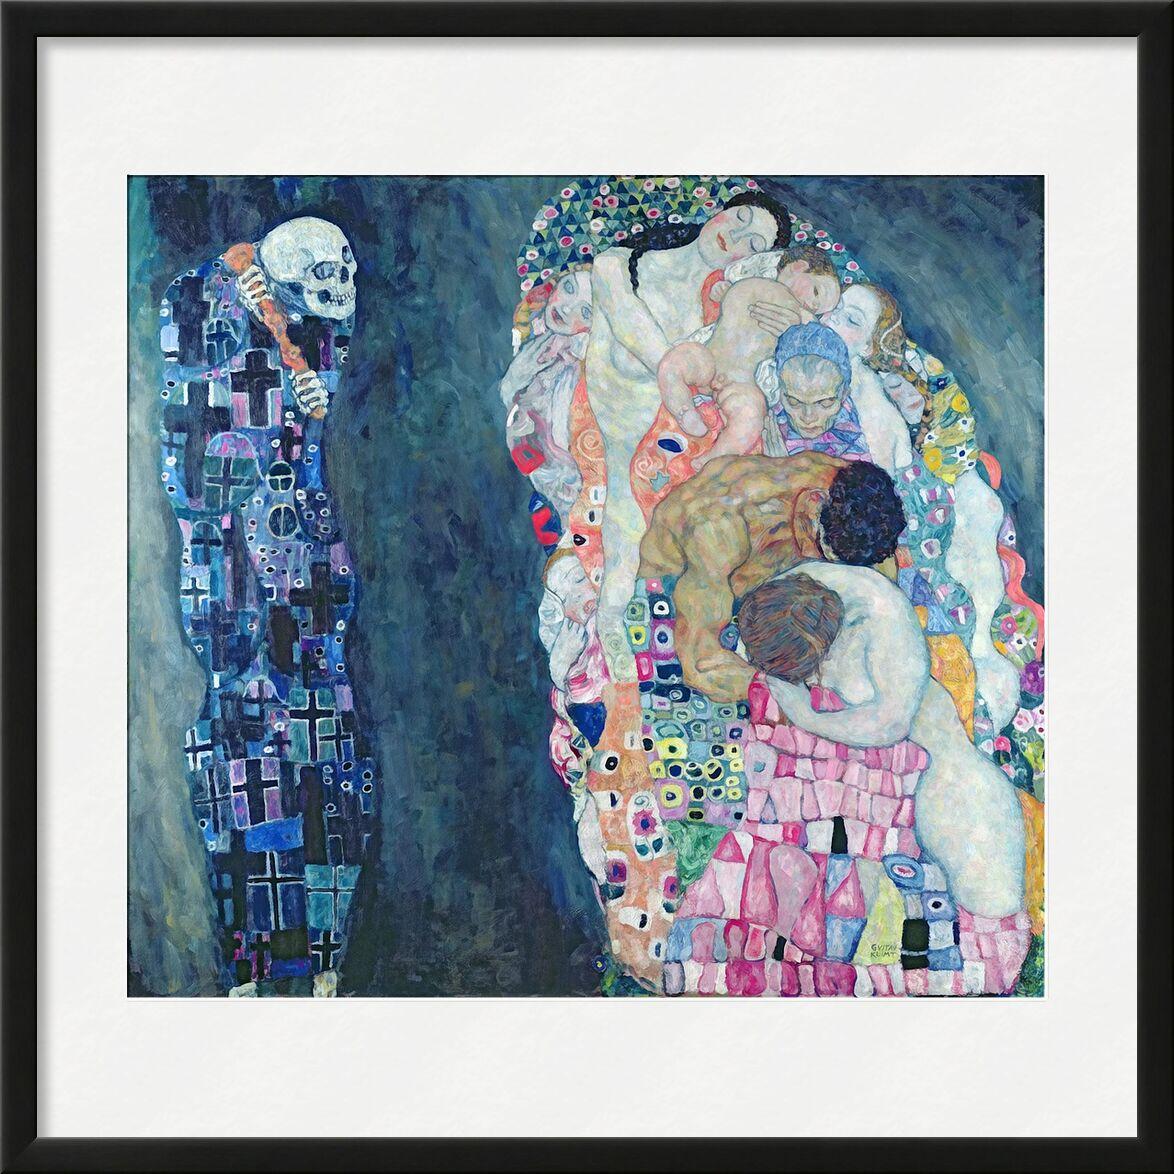 Death and Life, circa 1911 - Gustav Klimt von AUX BEAUX-ARTS, Prodi Art, Kreis des Lebens, abstrakt, Malerei, Tod, Leben, KLIMT